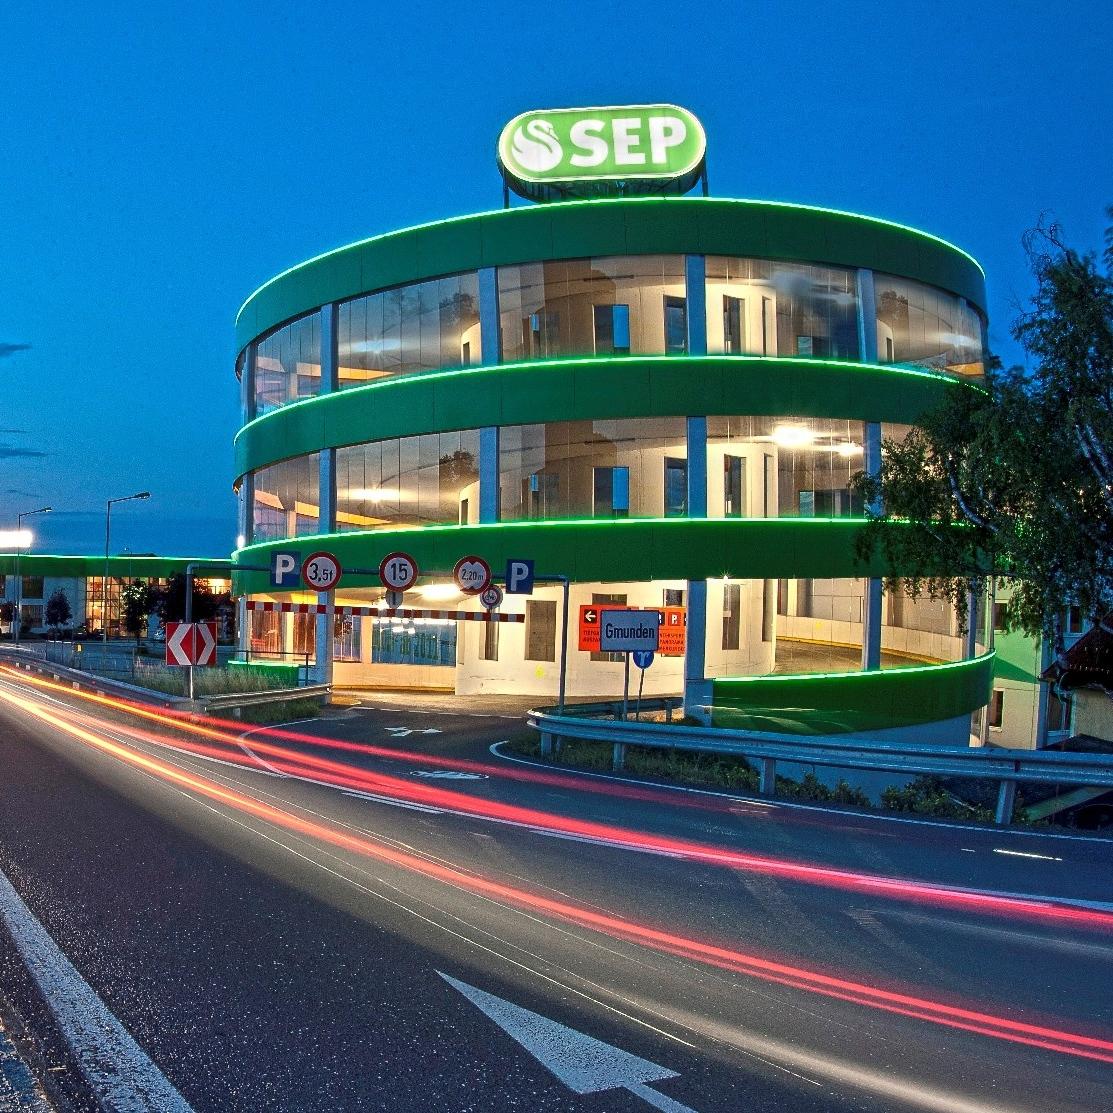 Salzkammergut Einkaufspark SEP